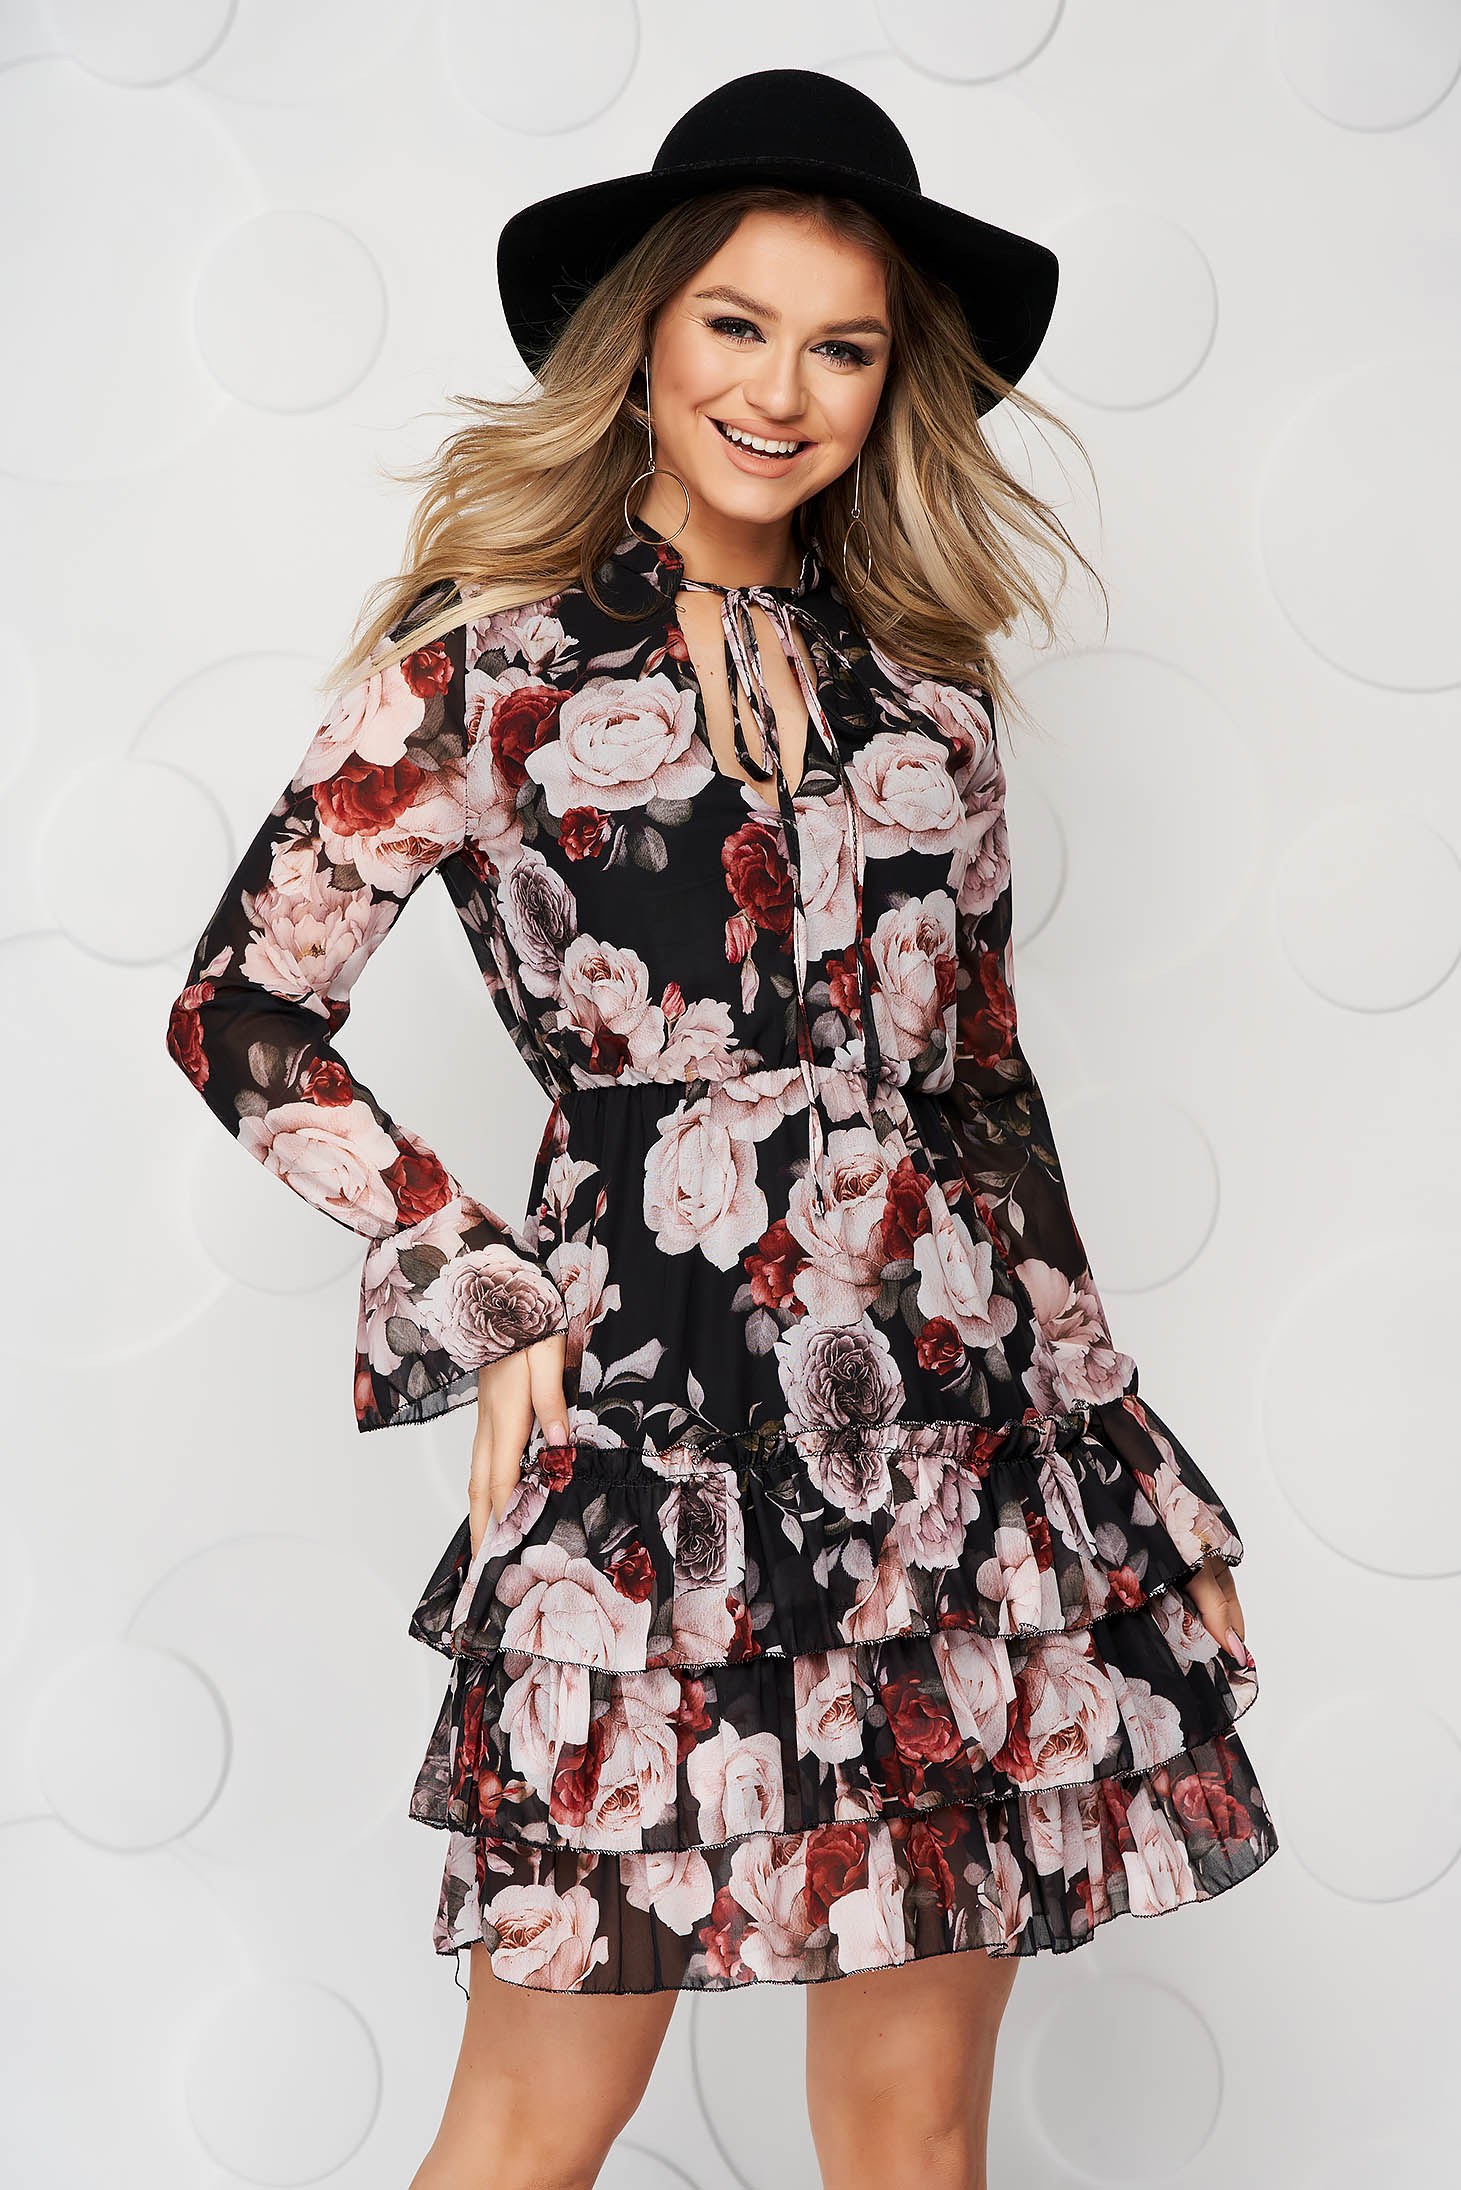 Dress from veil fabric